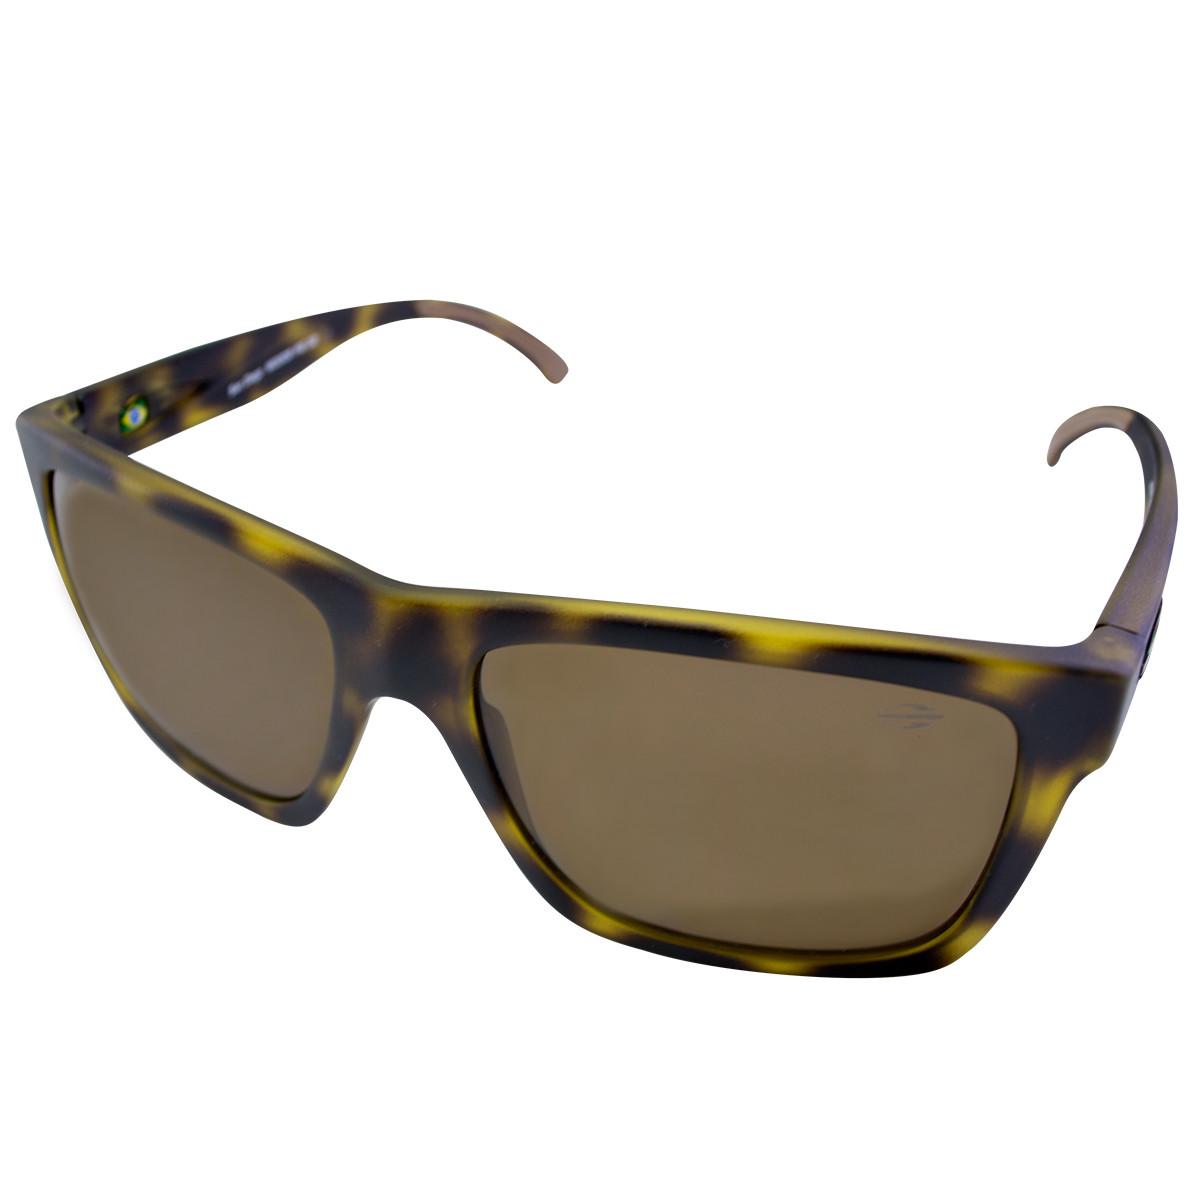 Óculos Mormaii San Diego Marrom Tortoise Lente Marrom ref M0009F1602 16eaabc21e